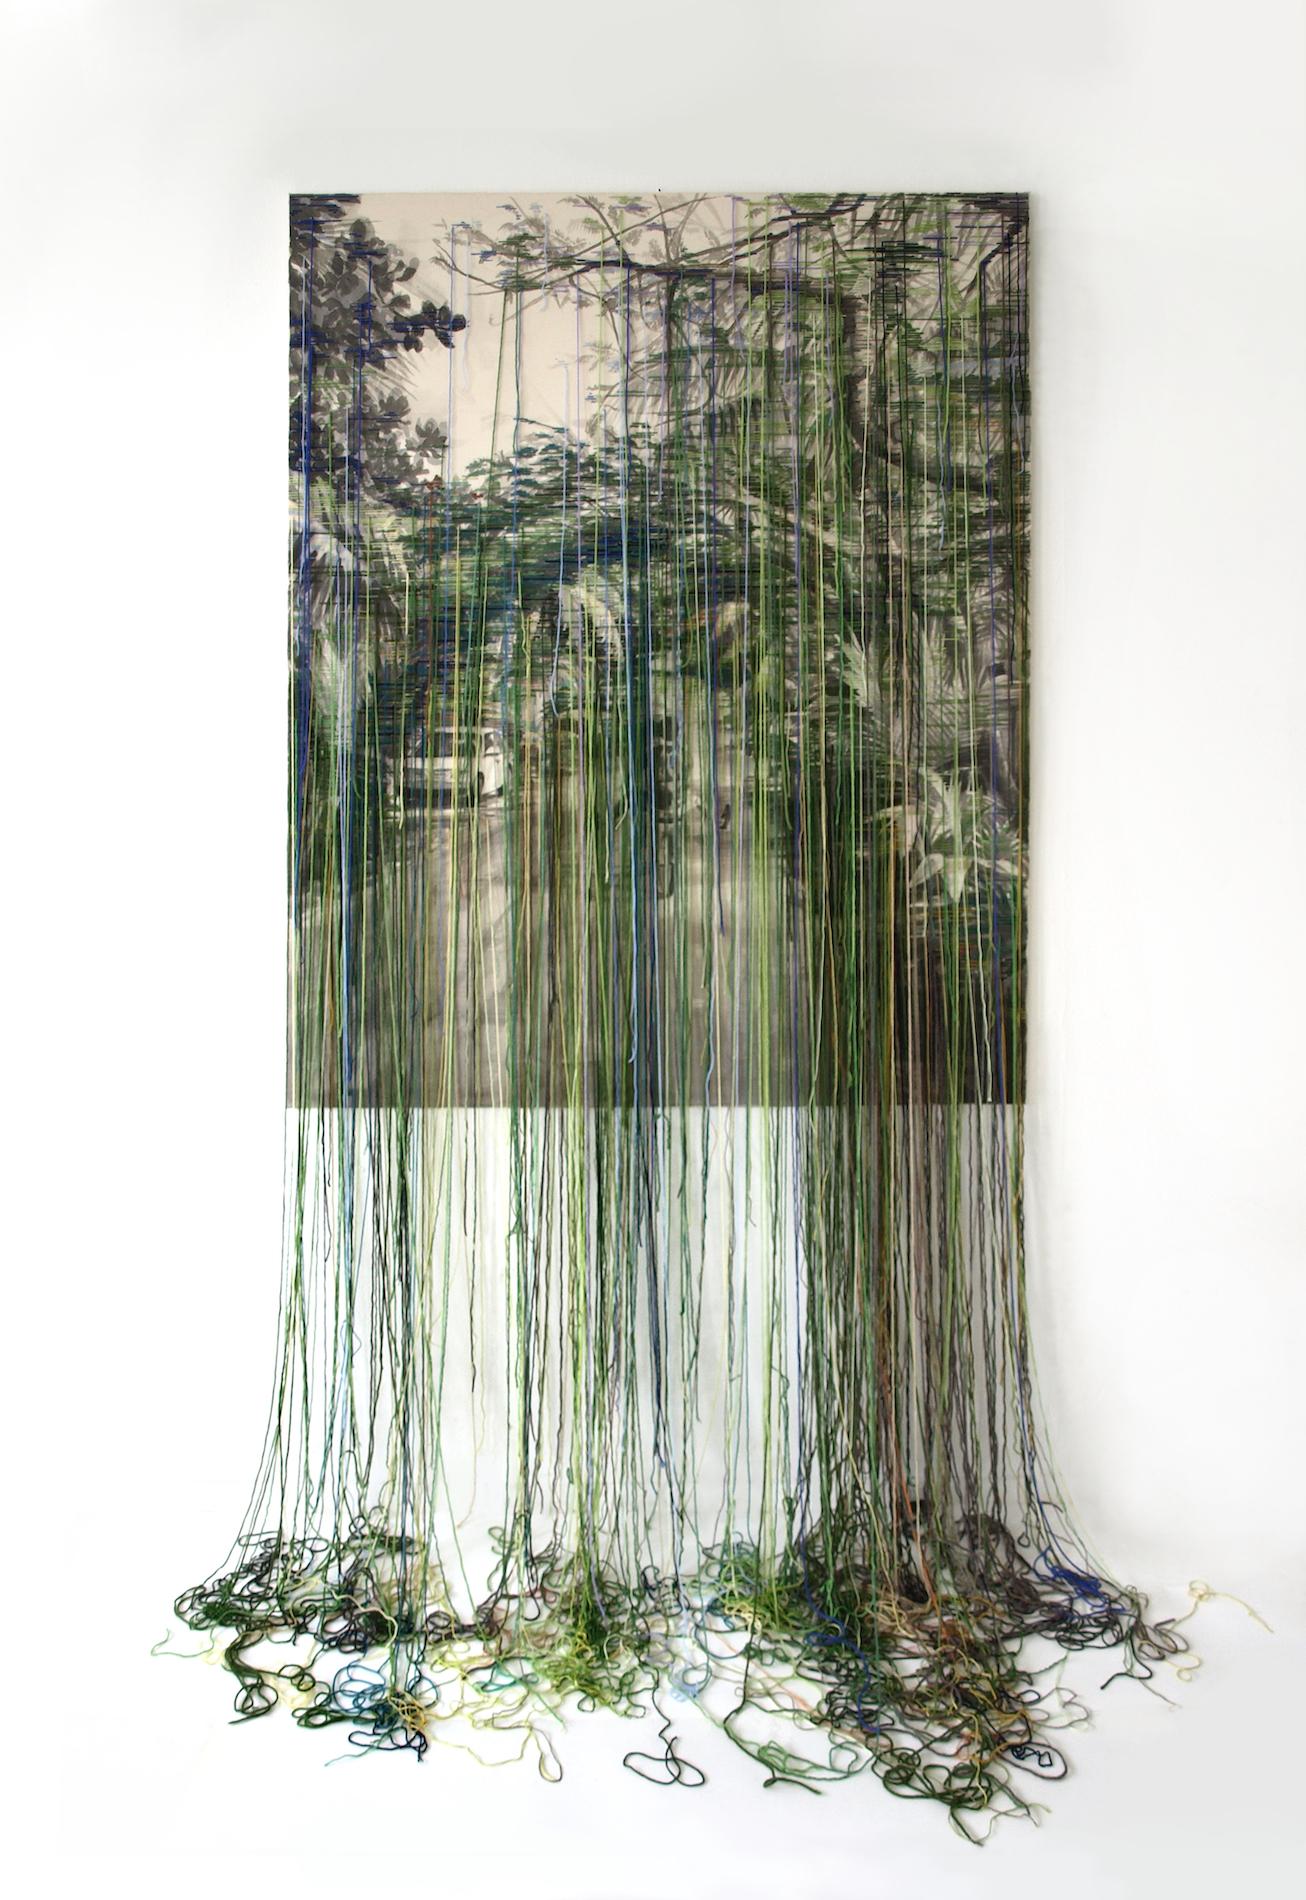 Linda Männel: Yucatan, 2017, Tusche/Garn auf Leinwand, 130 x 210 cm